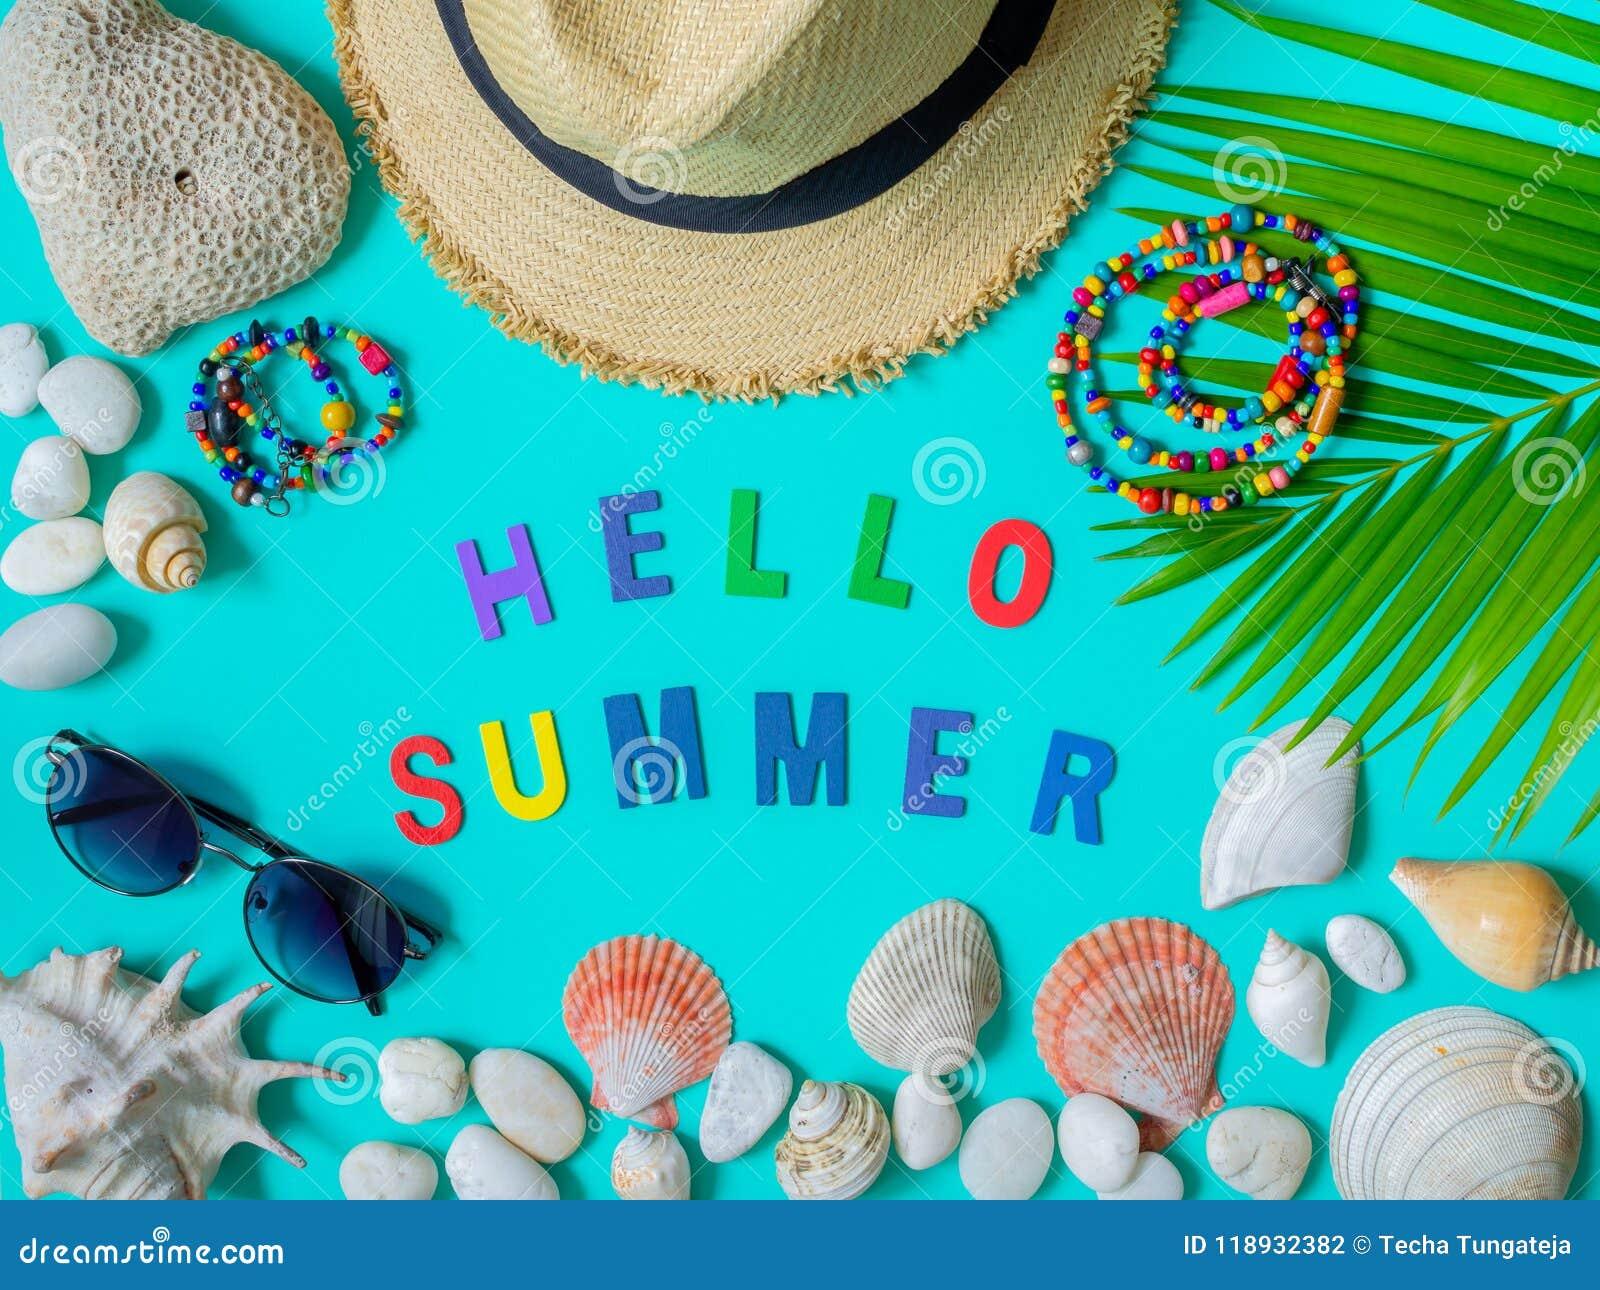 717213f9466 Hello Summer stock photo. Image of palm